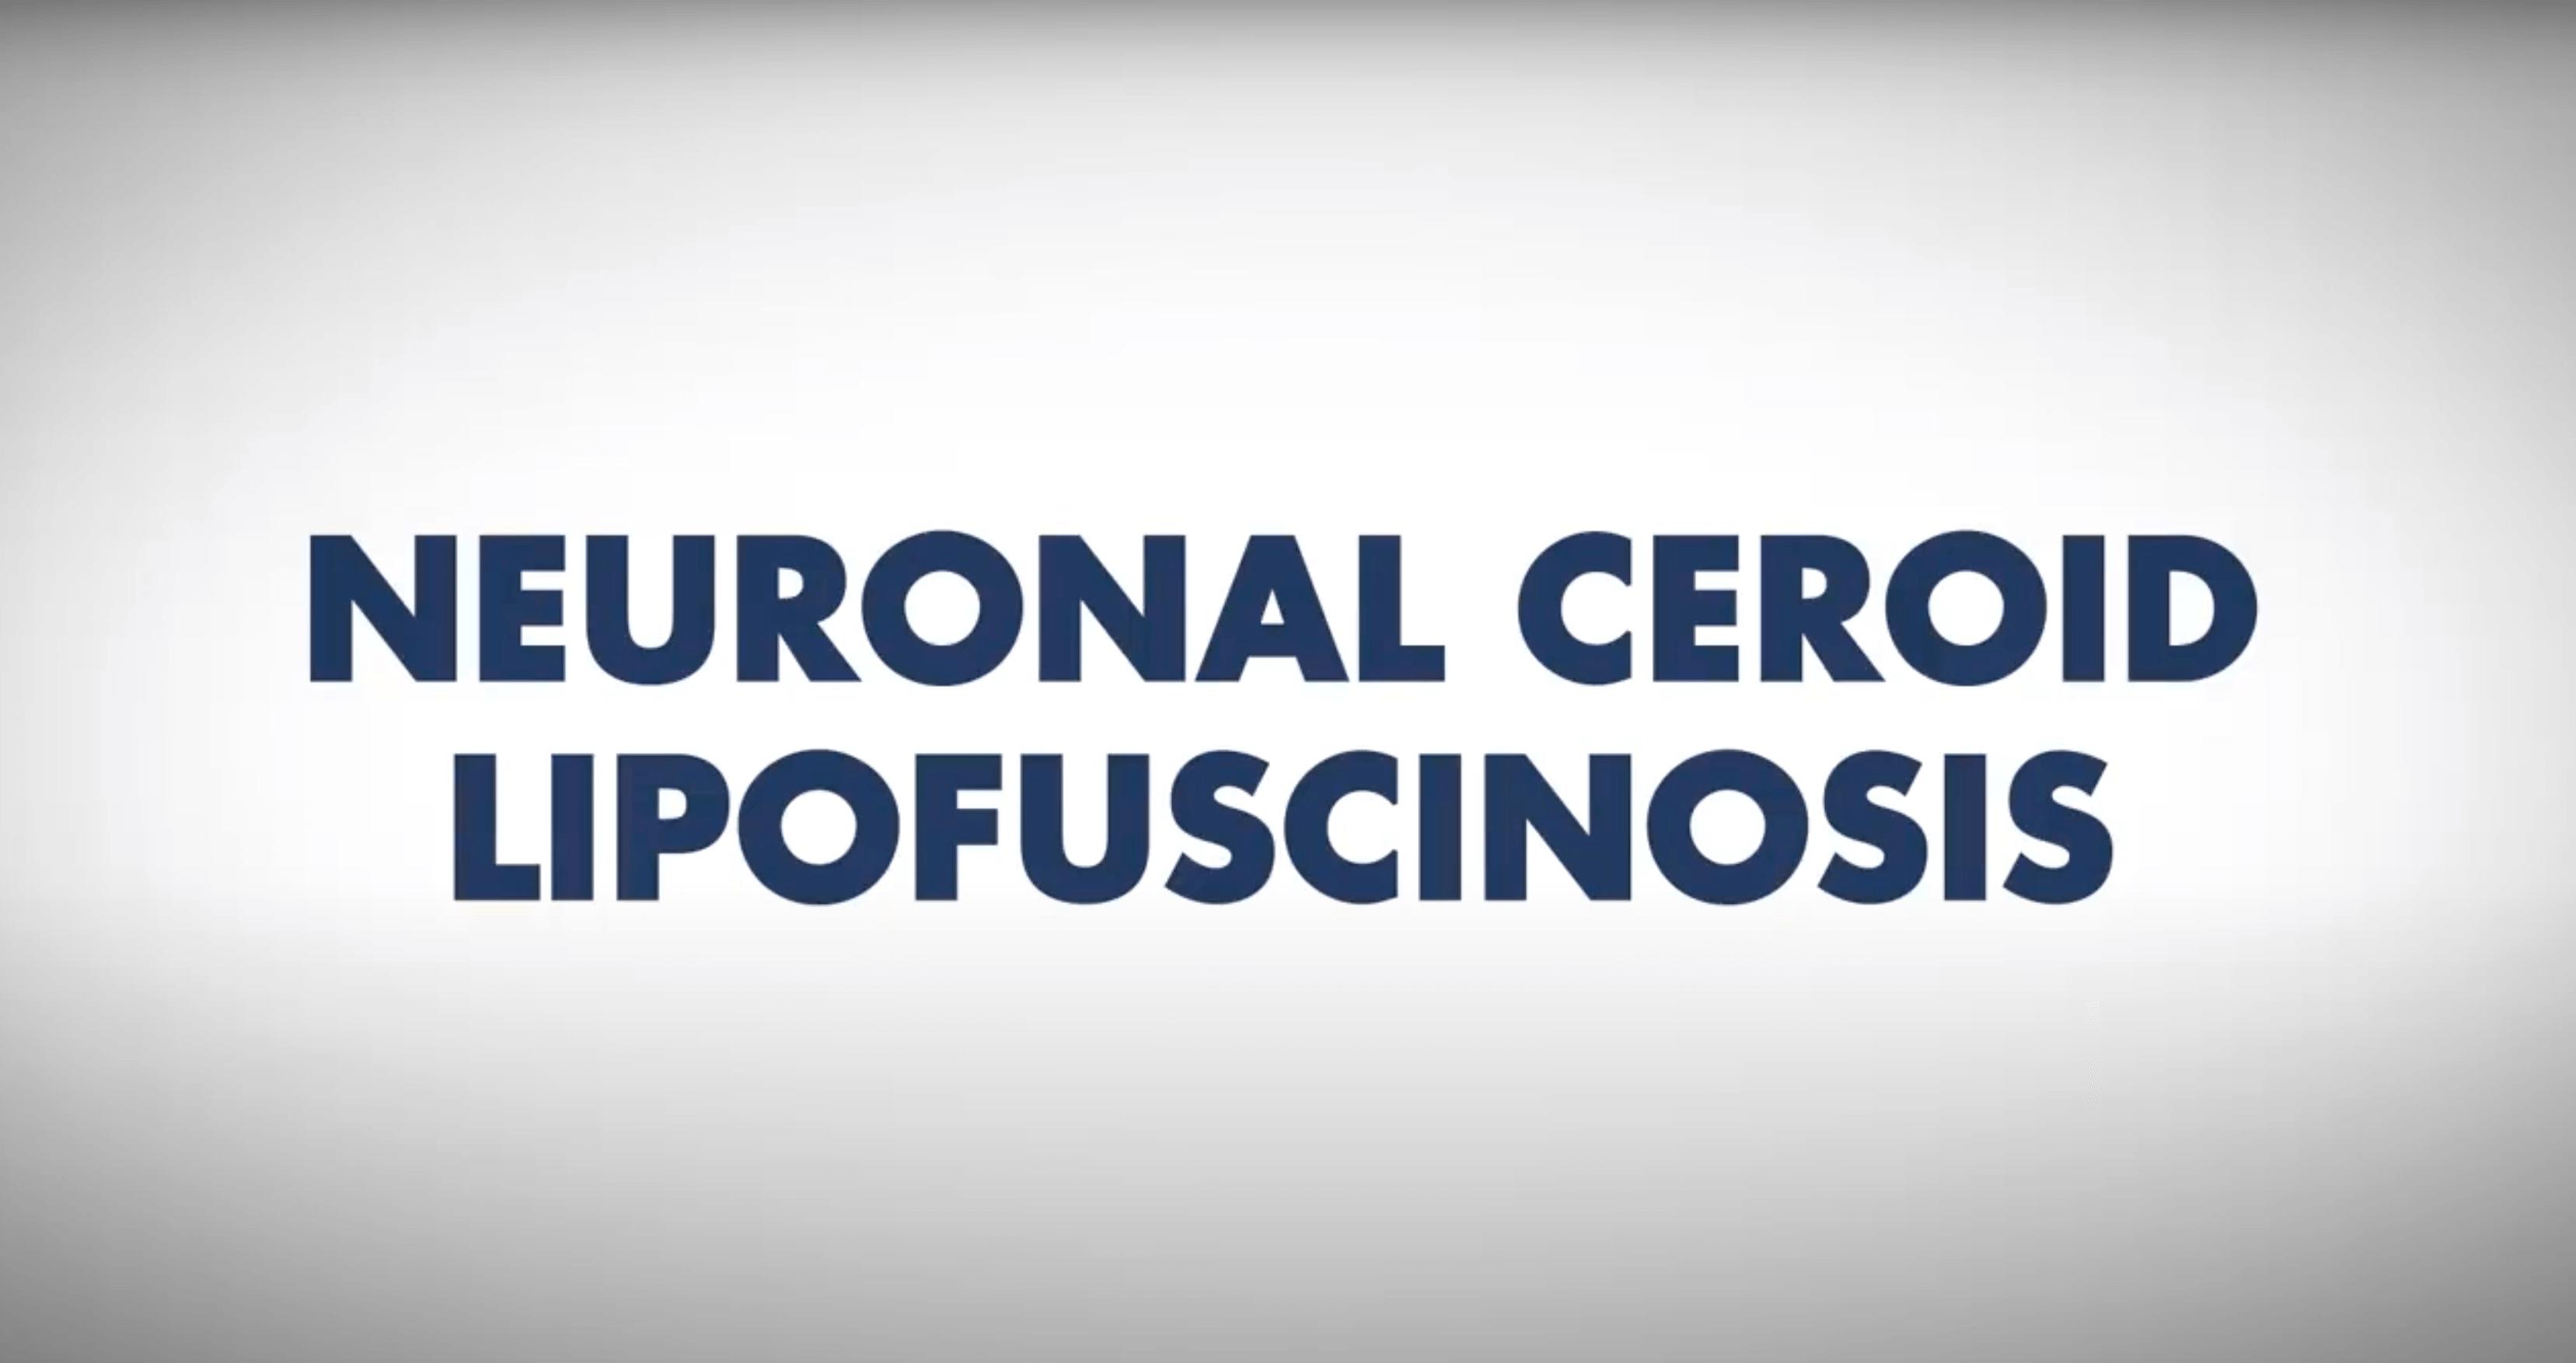 Image: How to Pronounce Neuronal Ceroid Lipofuscinosis video screenshot